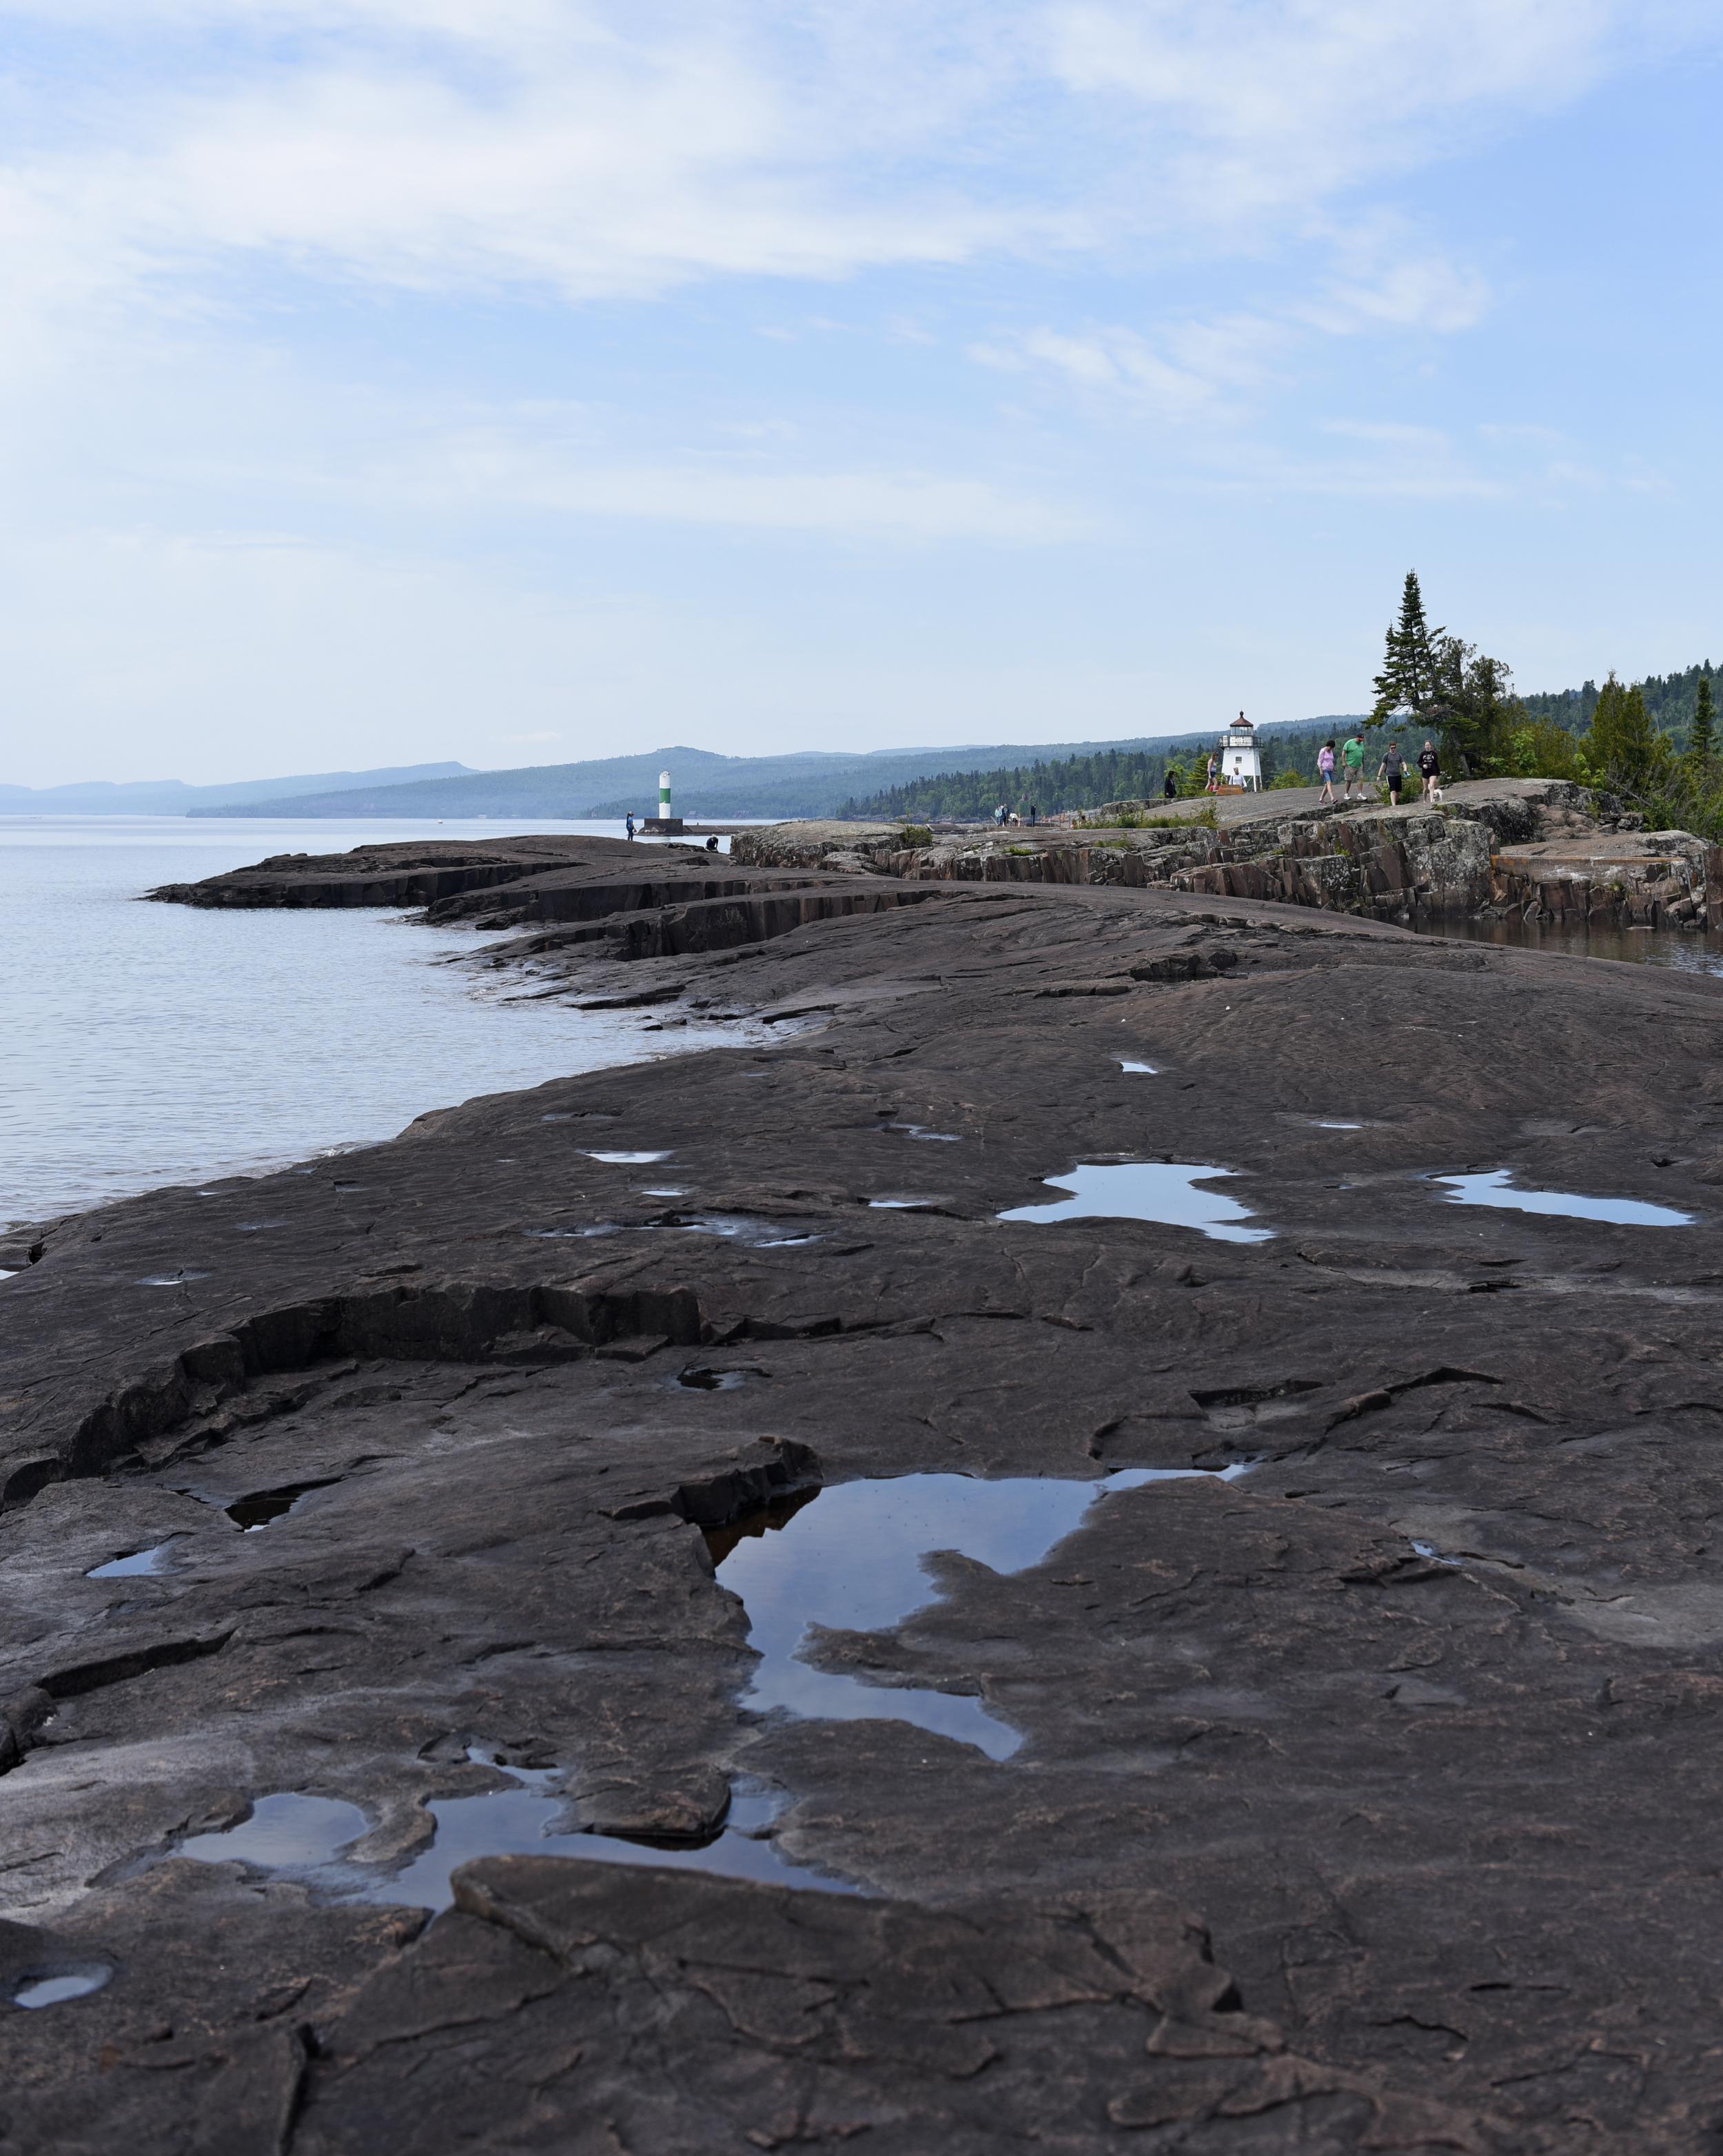 The Lake Superior shoreline in Grand Marais, Minn.